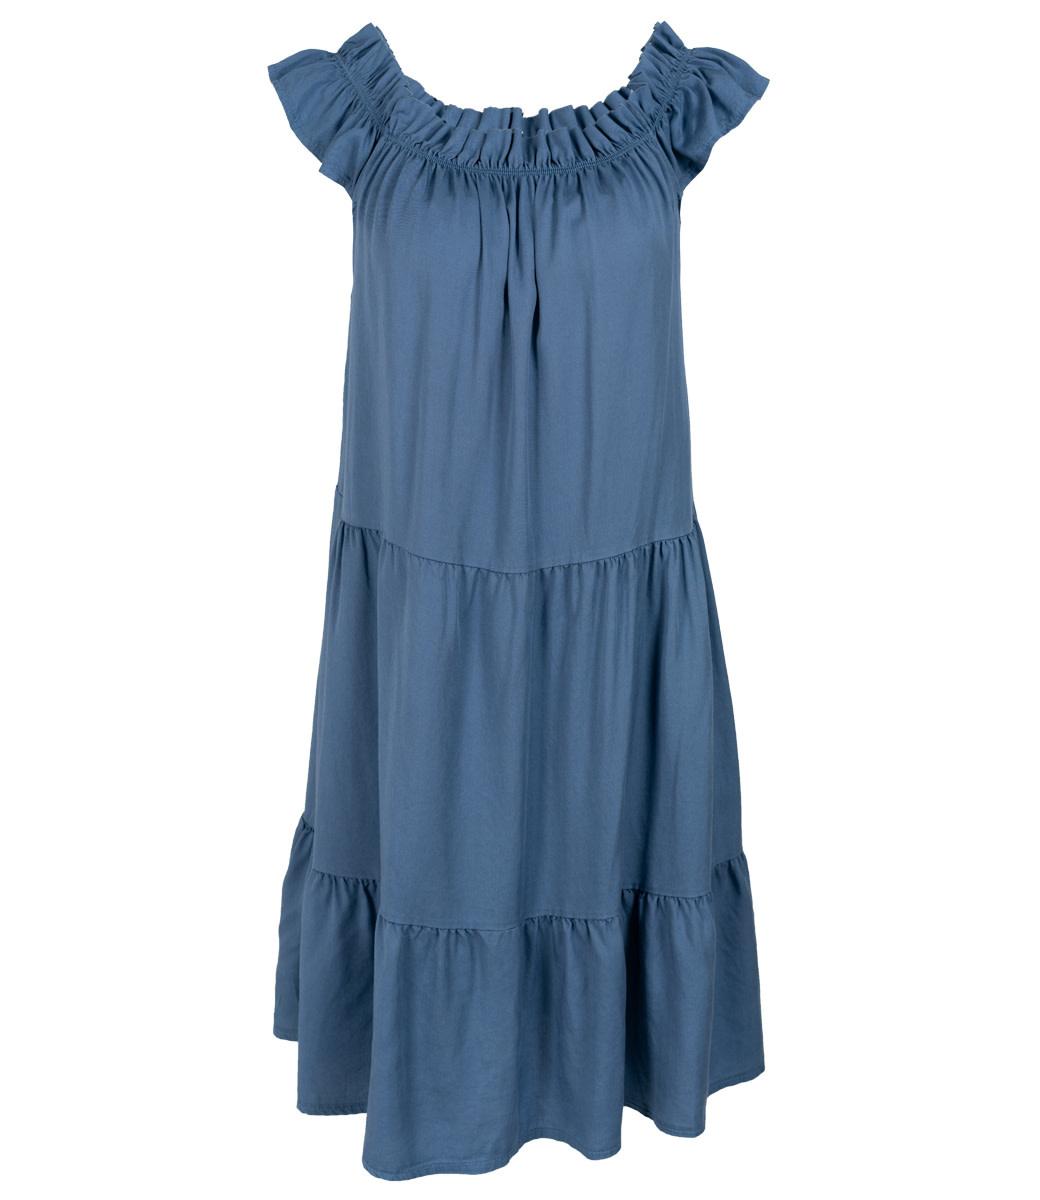 Wannahavesfashion Jurk jeansblauw Petra